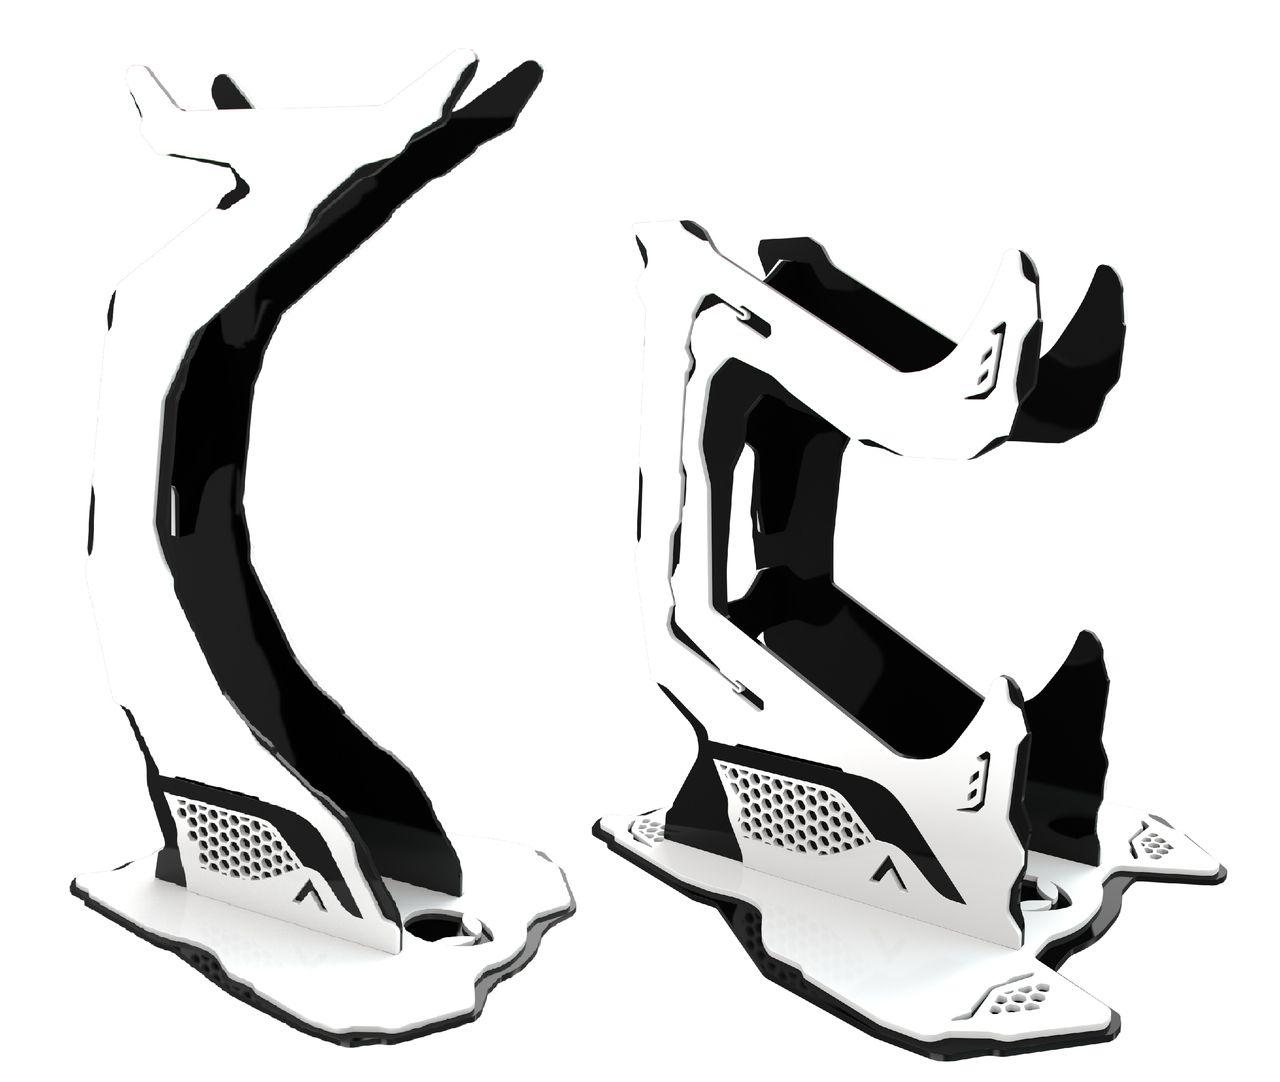 Combo Suporte Headset Alien  E Suporte Controle Rise Mode Alien 10% Desconto  - Loja Rise Mode